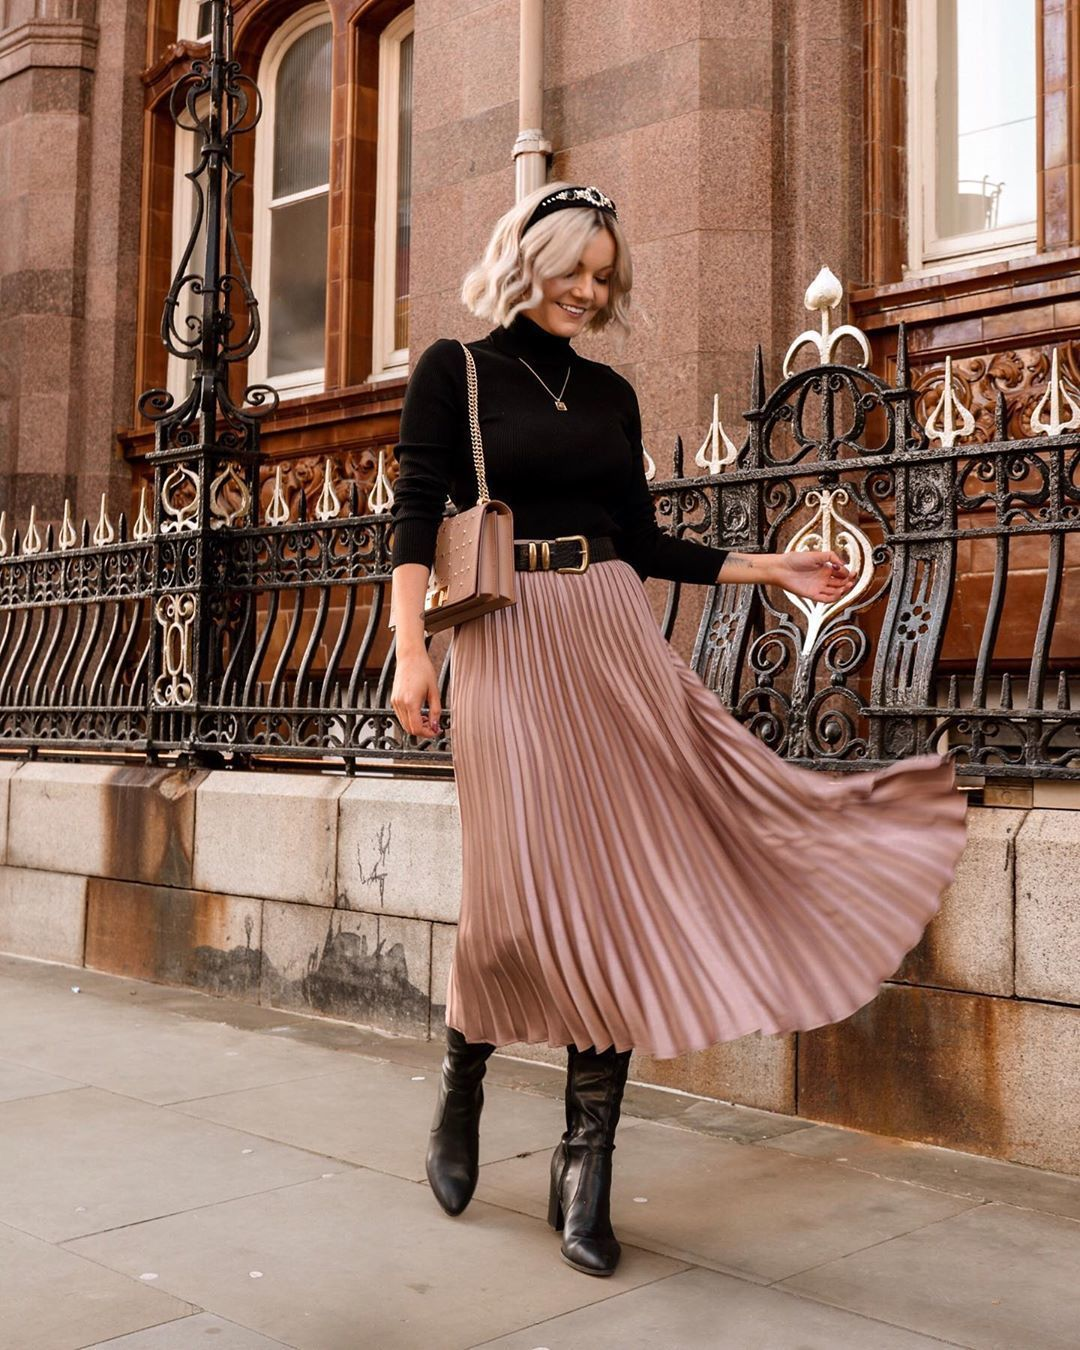 skirt pleated skirt midi skirt knee high boots black boots black turtleneck top bag